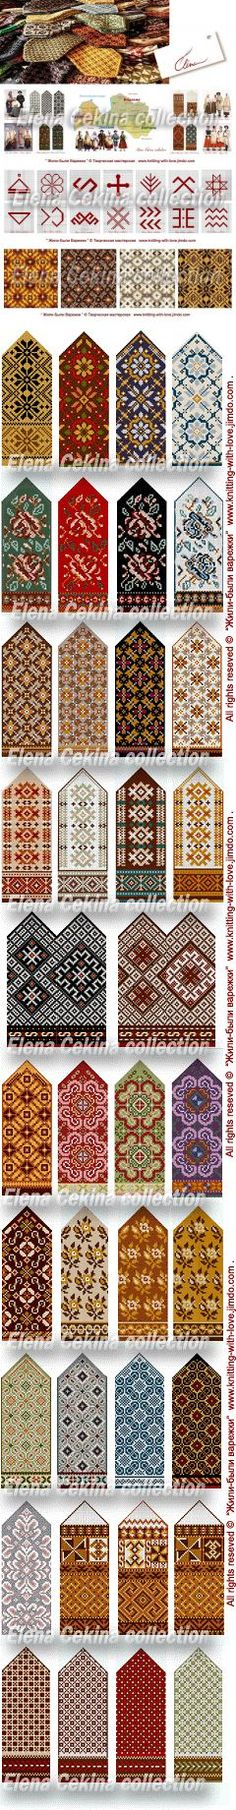 Г Л А В Н А Я - Вязание, варежки, схемы, узоры, мастер-классы, символы в орнаменте - Knitting, mittens, jacquard patterns, master-class, symbols in ornament,